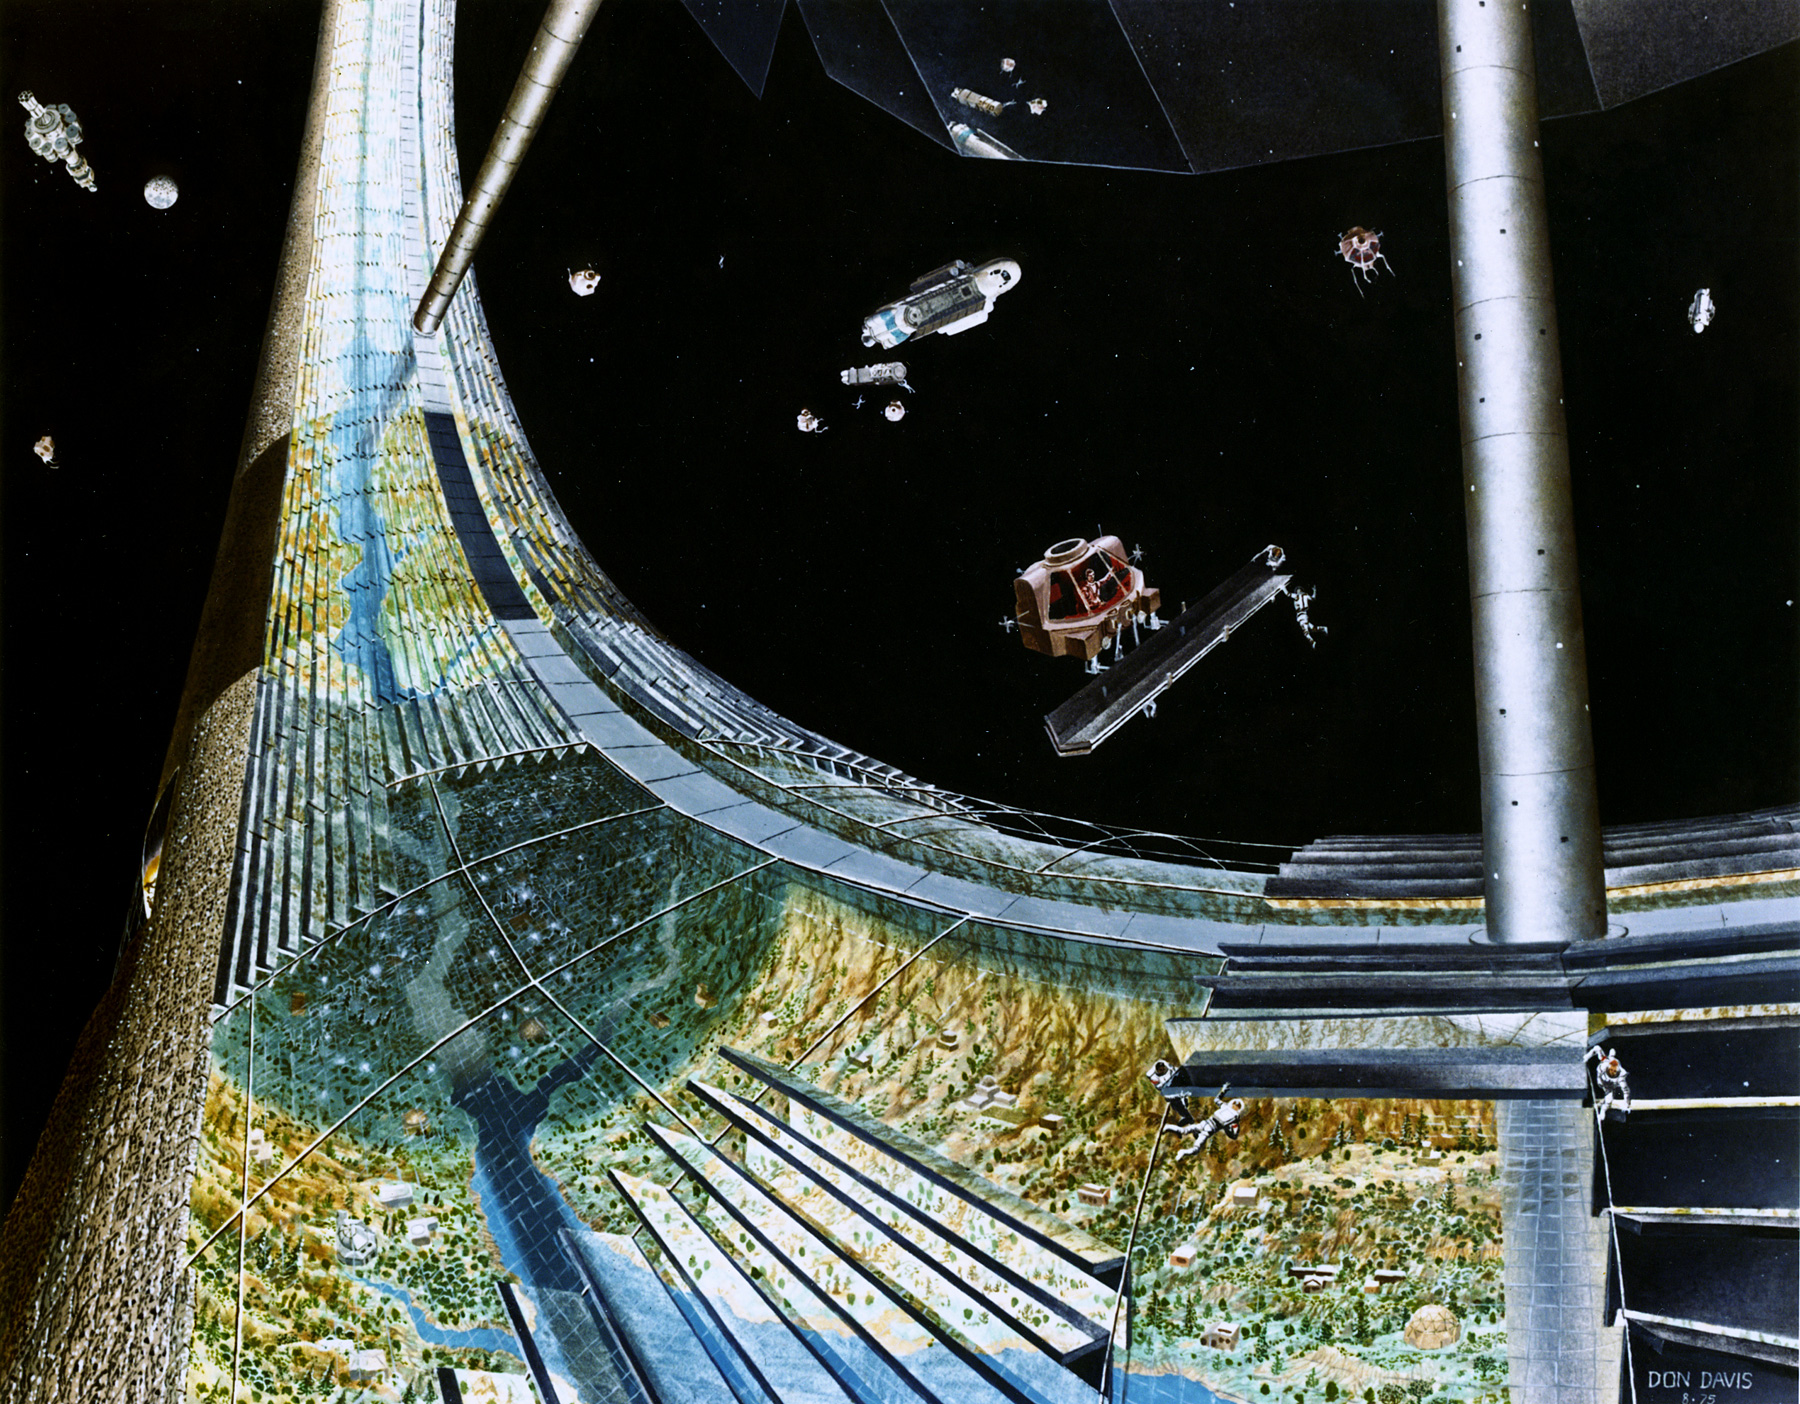 ECLSS: Sopravvivere su una stazione orbitante